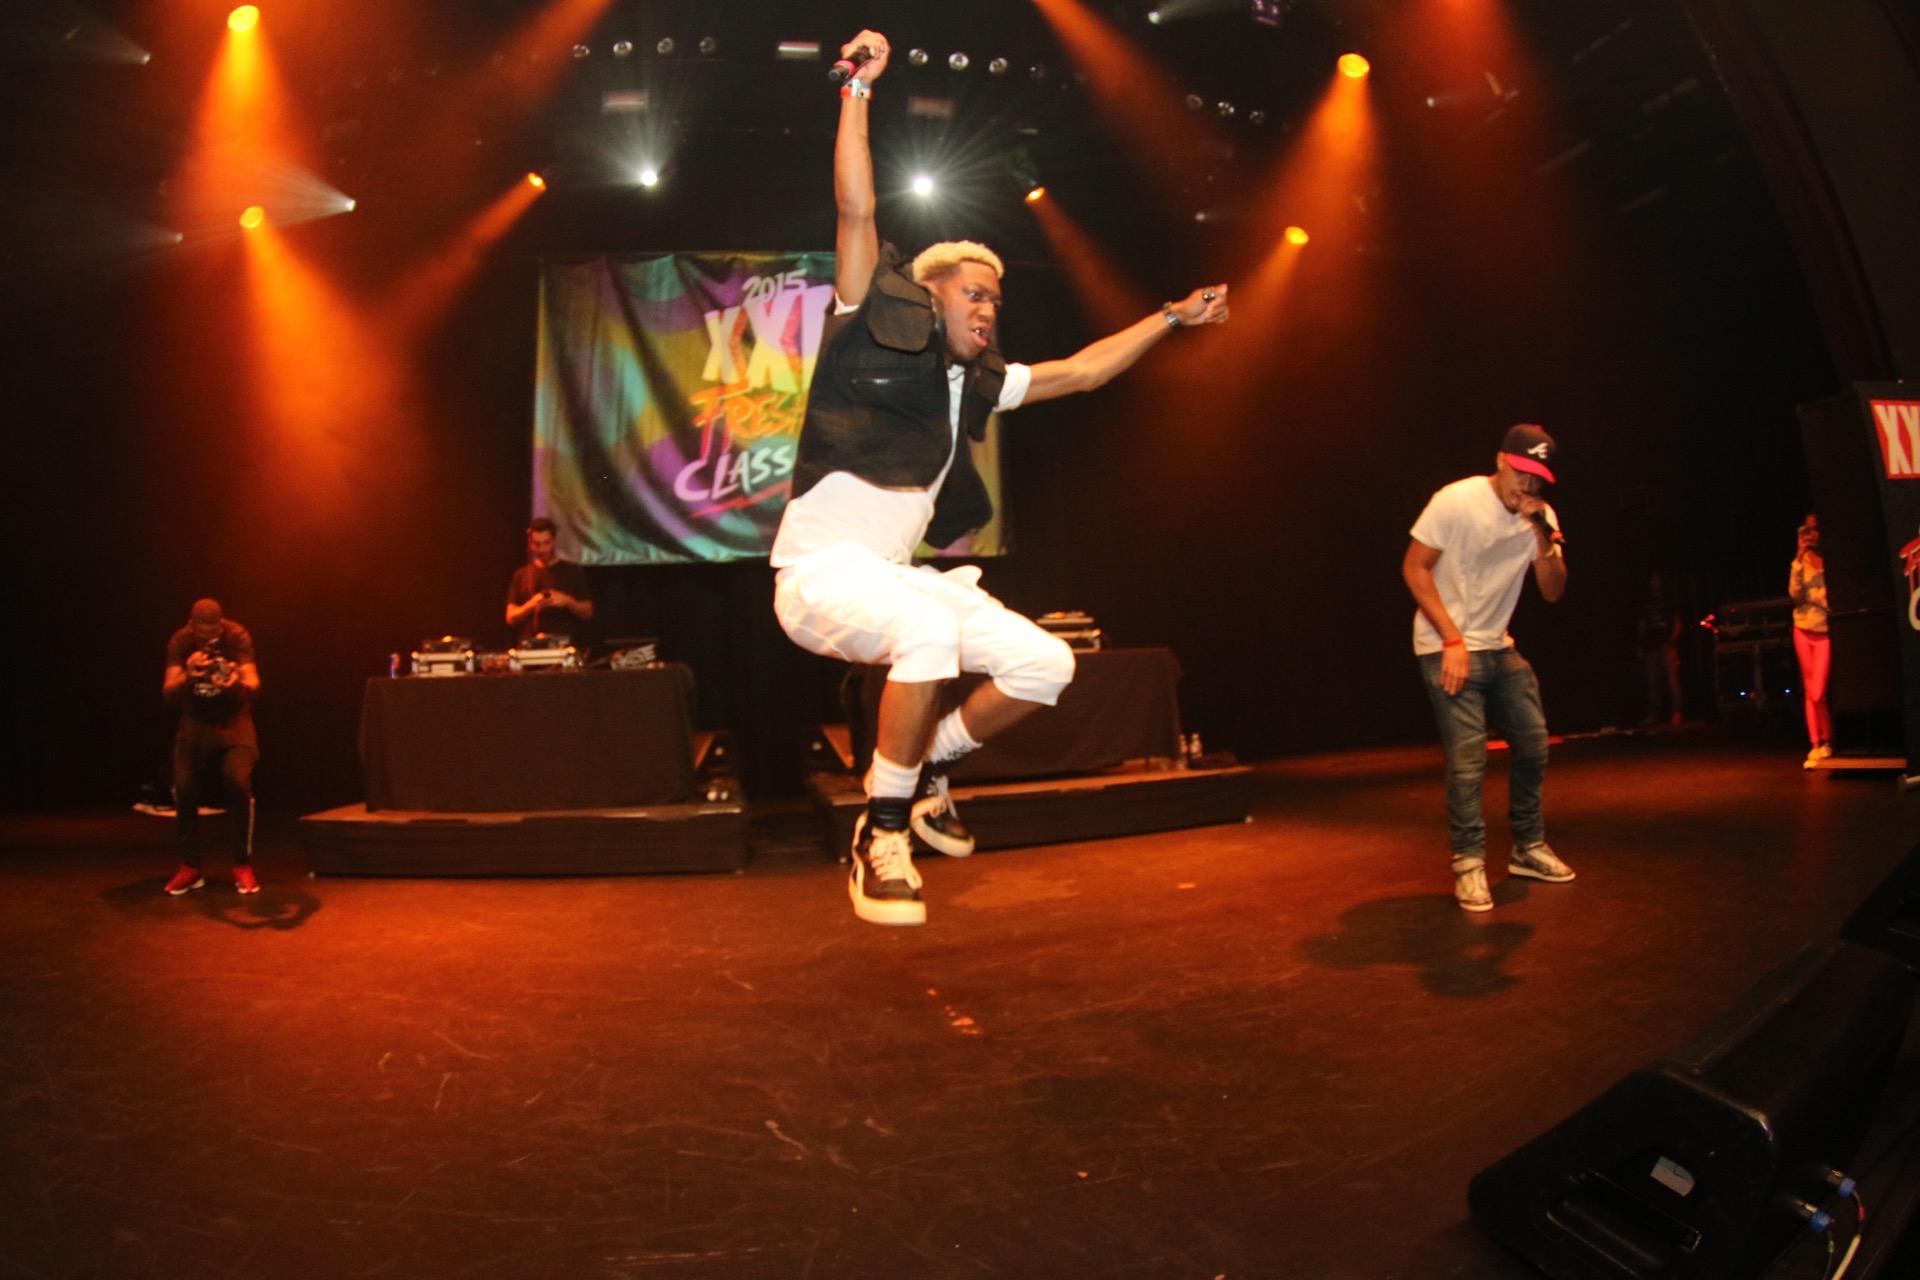 OG Maco on stage